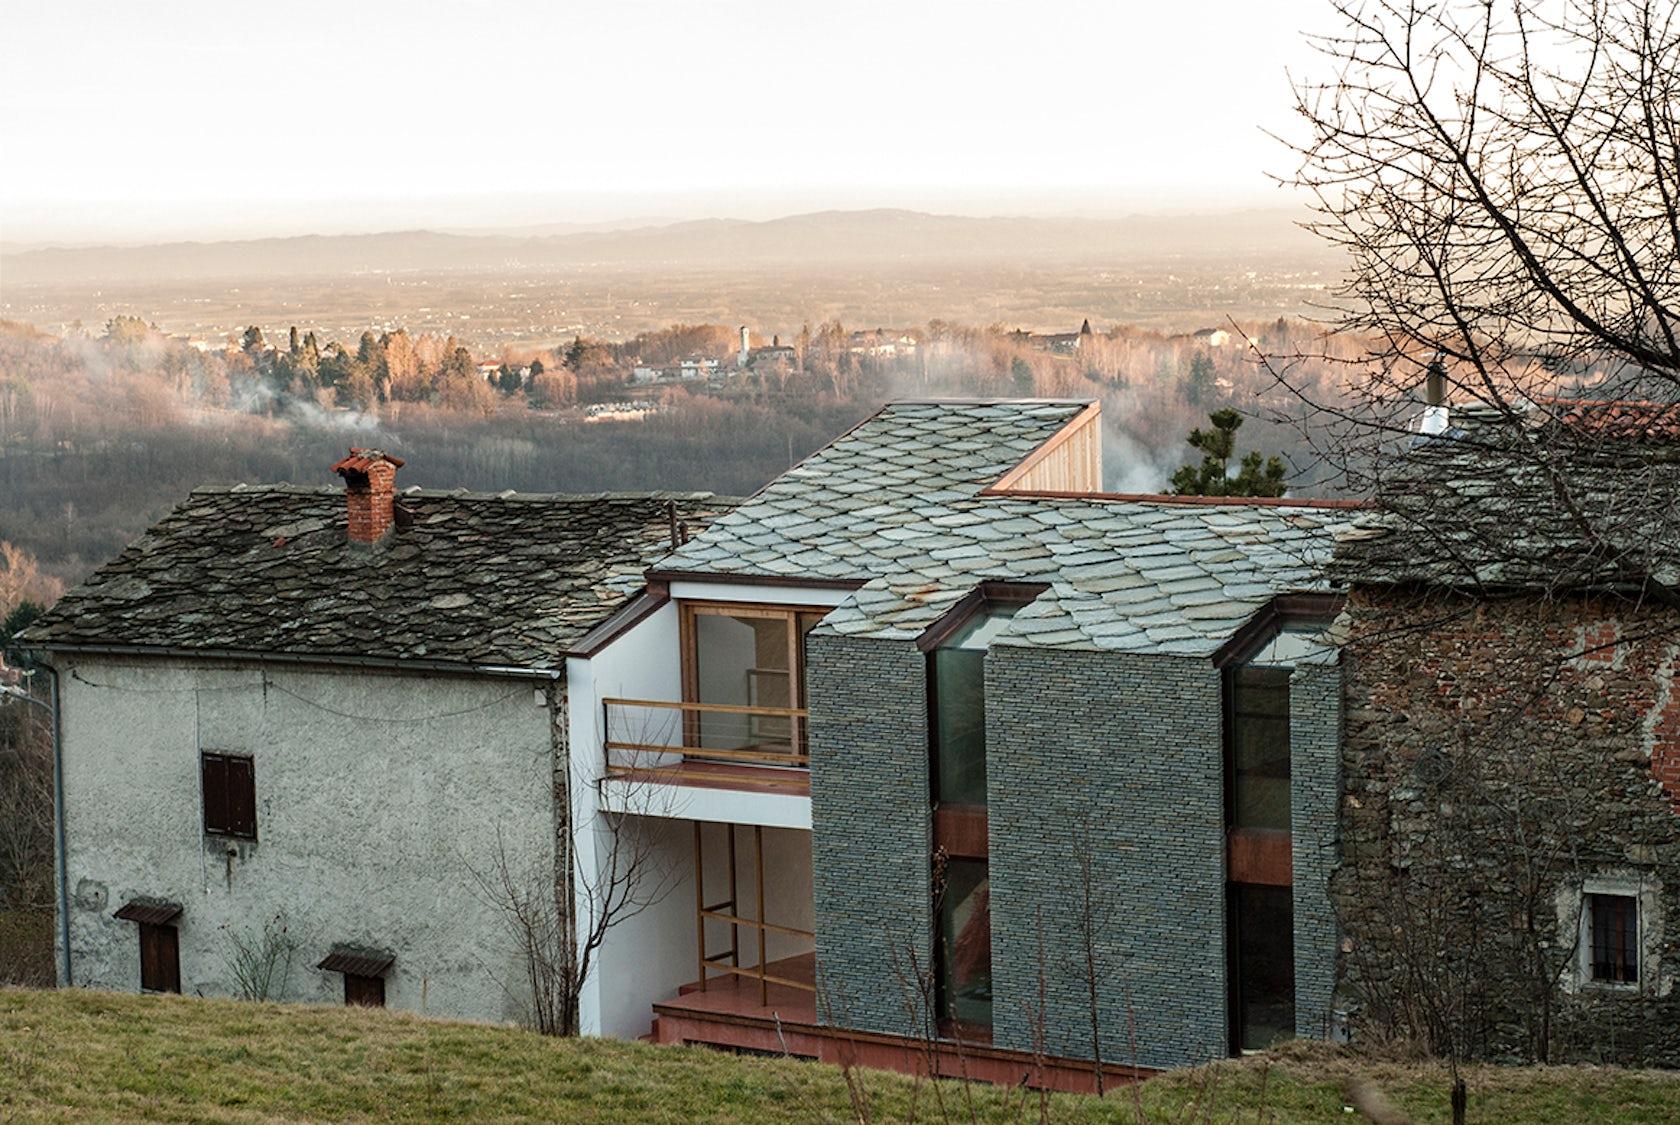 Alpine foothills house architizer for Case con facciate in pietra